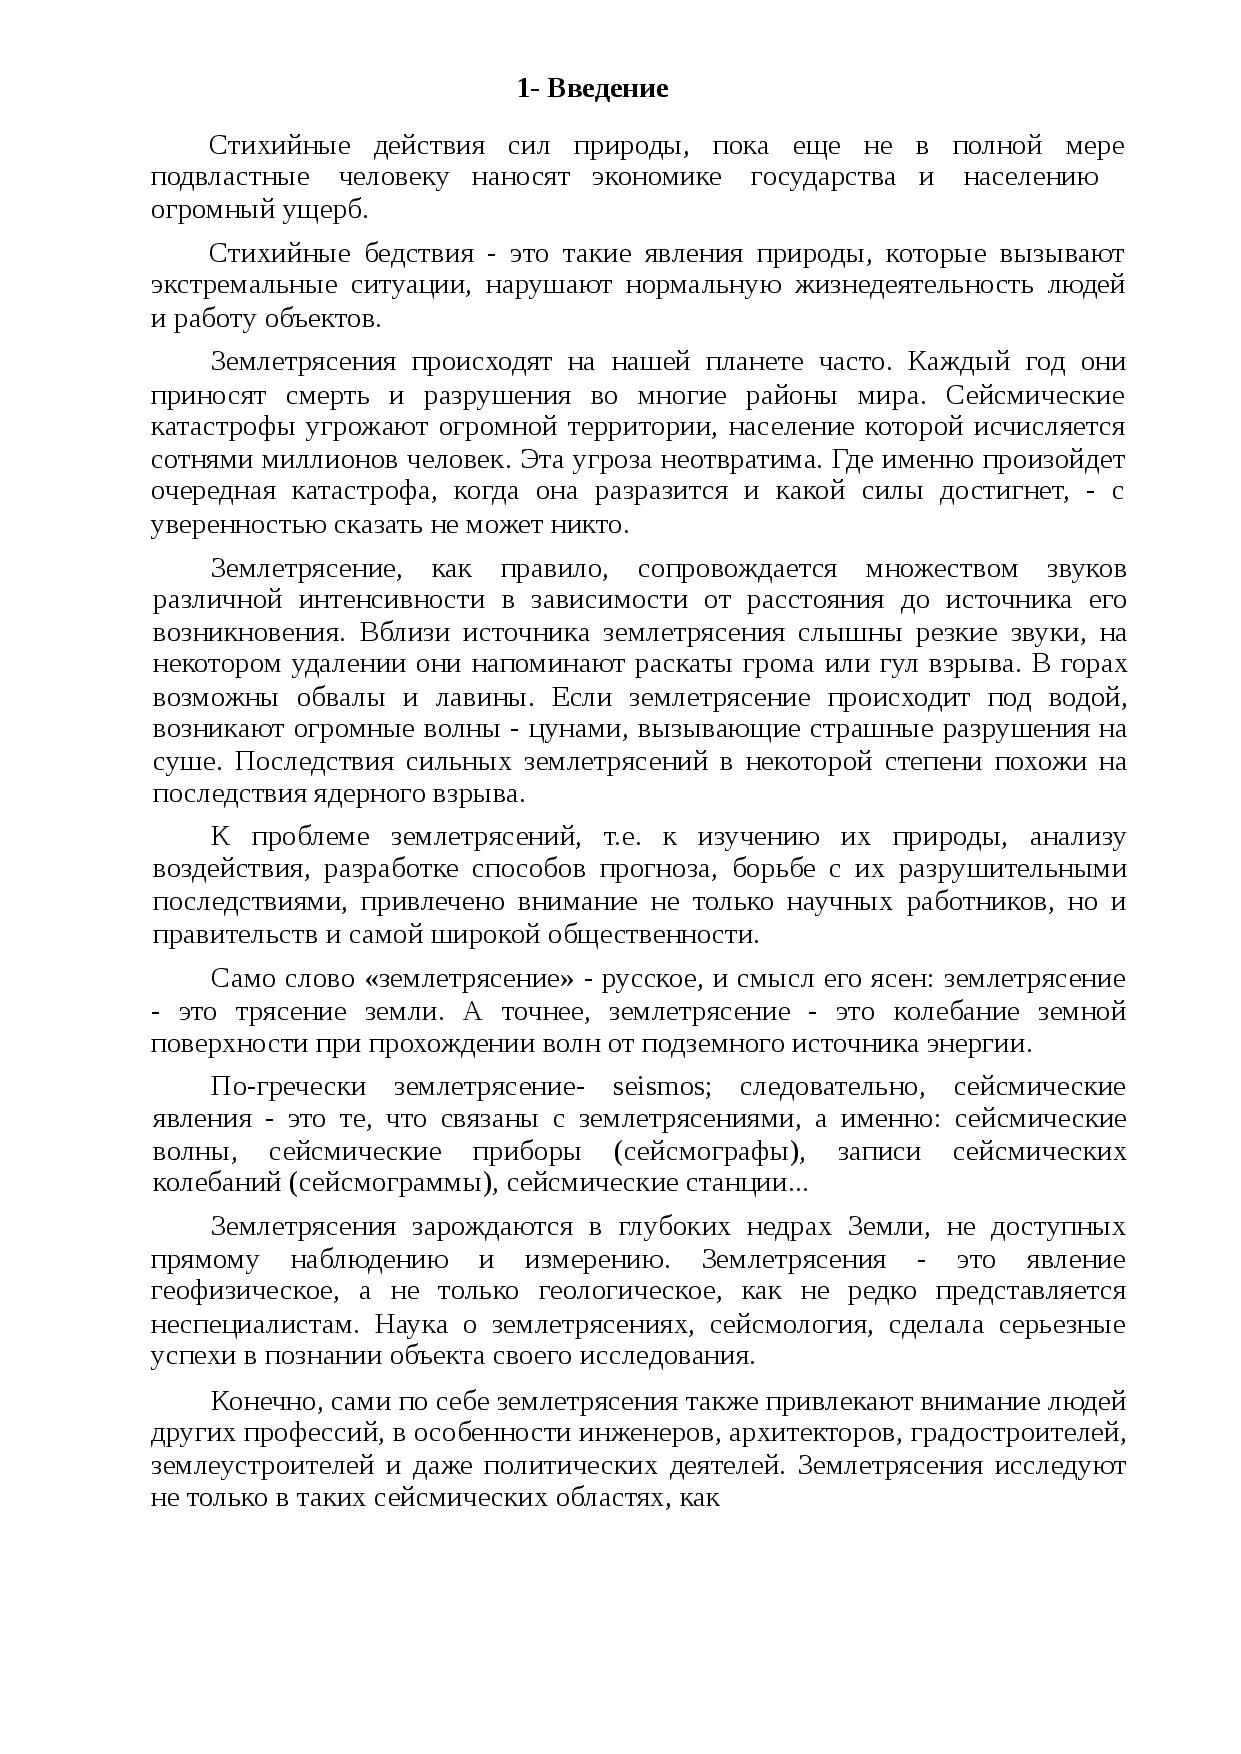 Землетрясения. их происхождение и характеристика (стр. 1 )